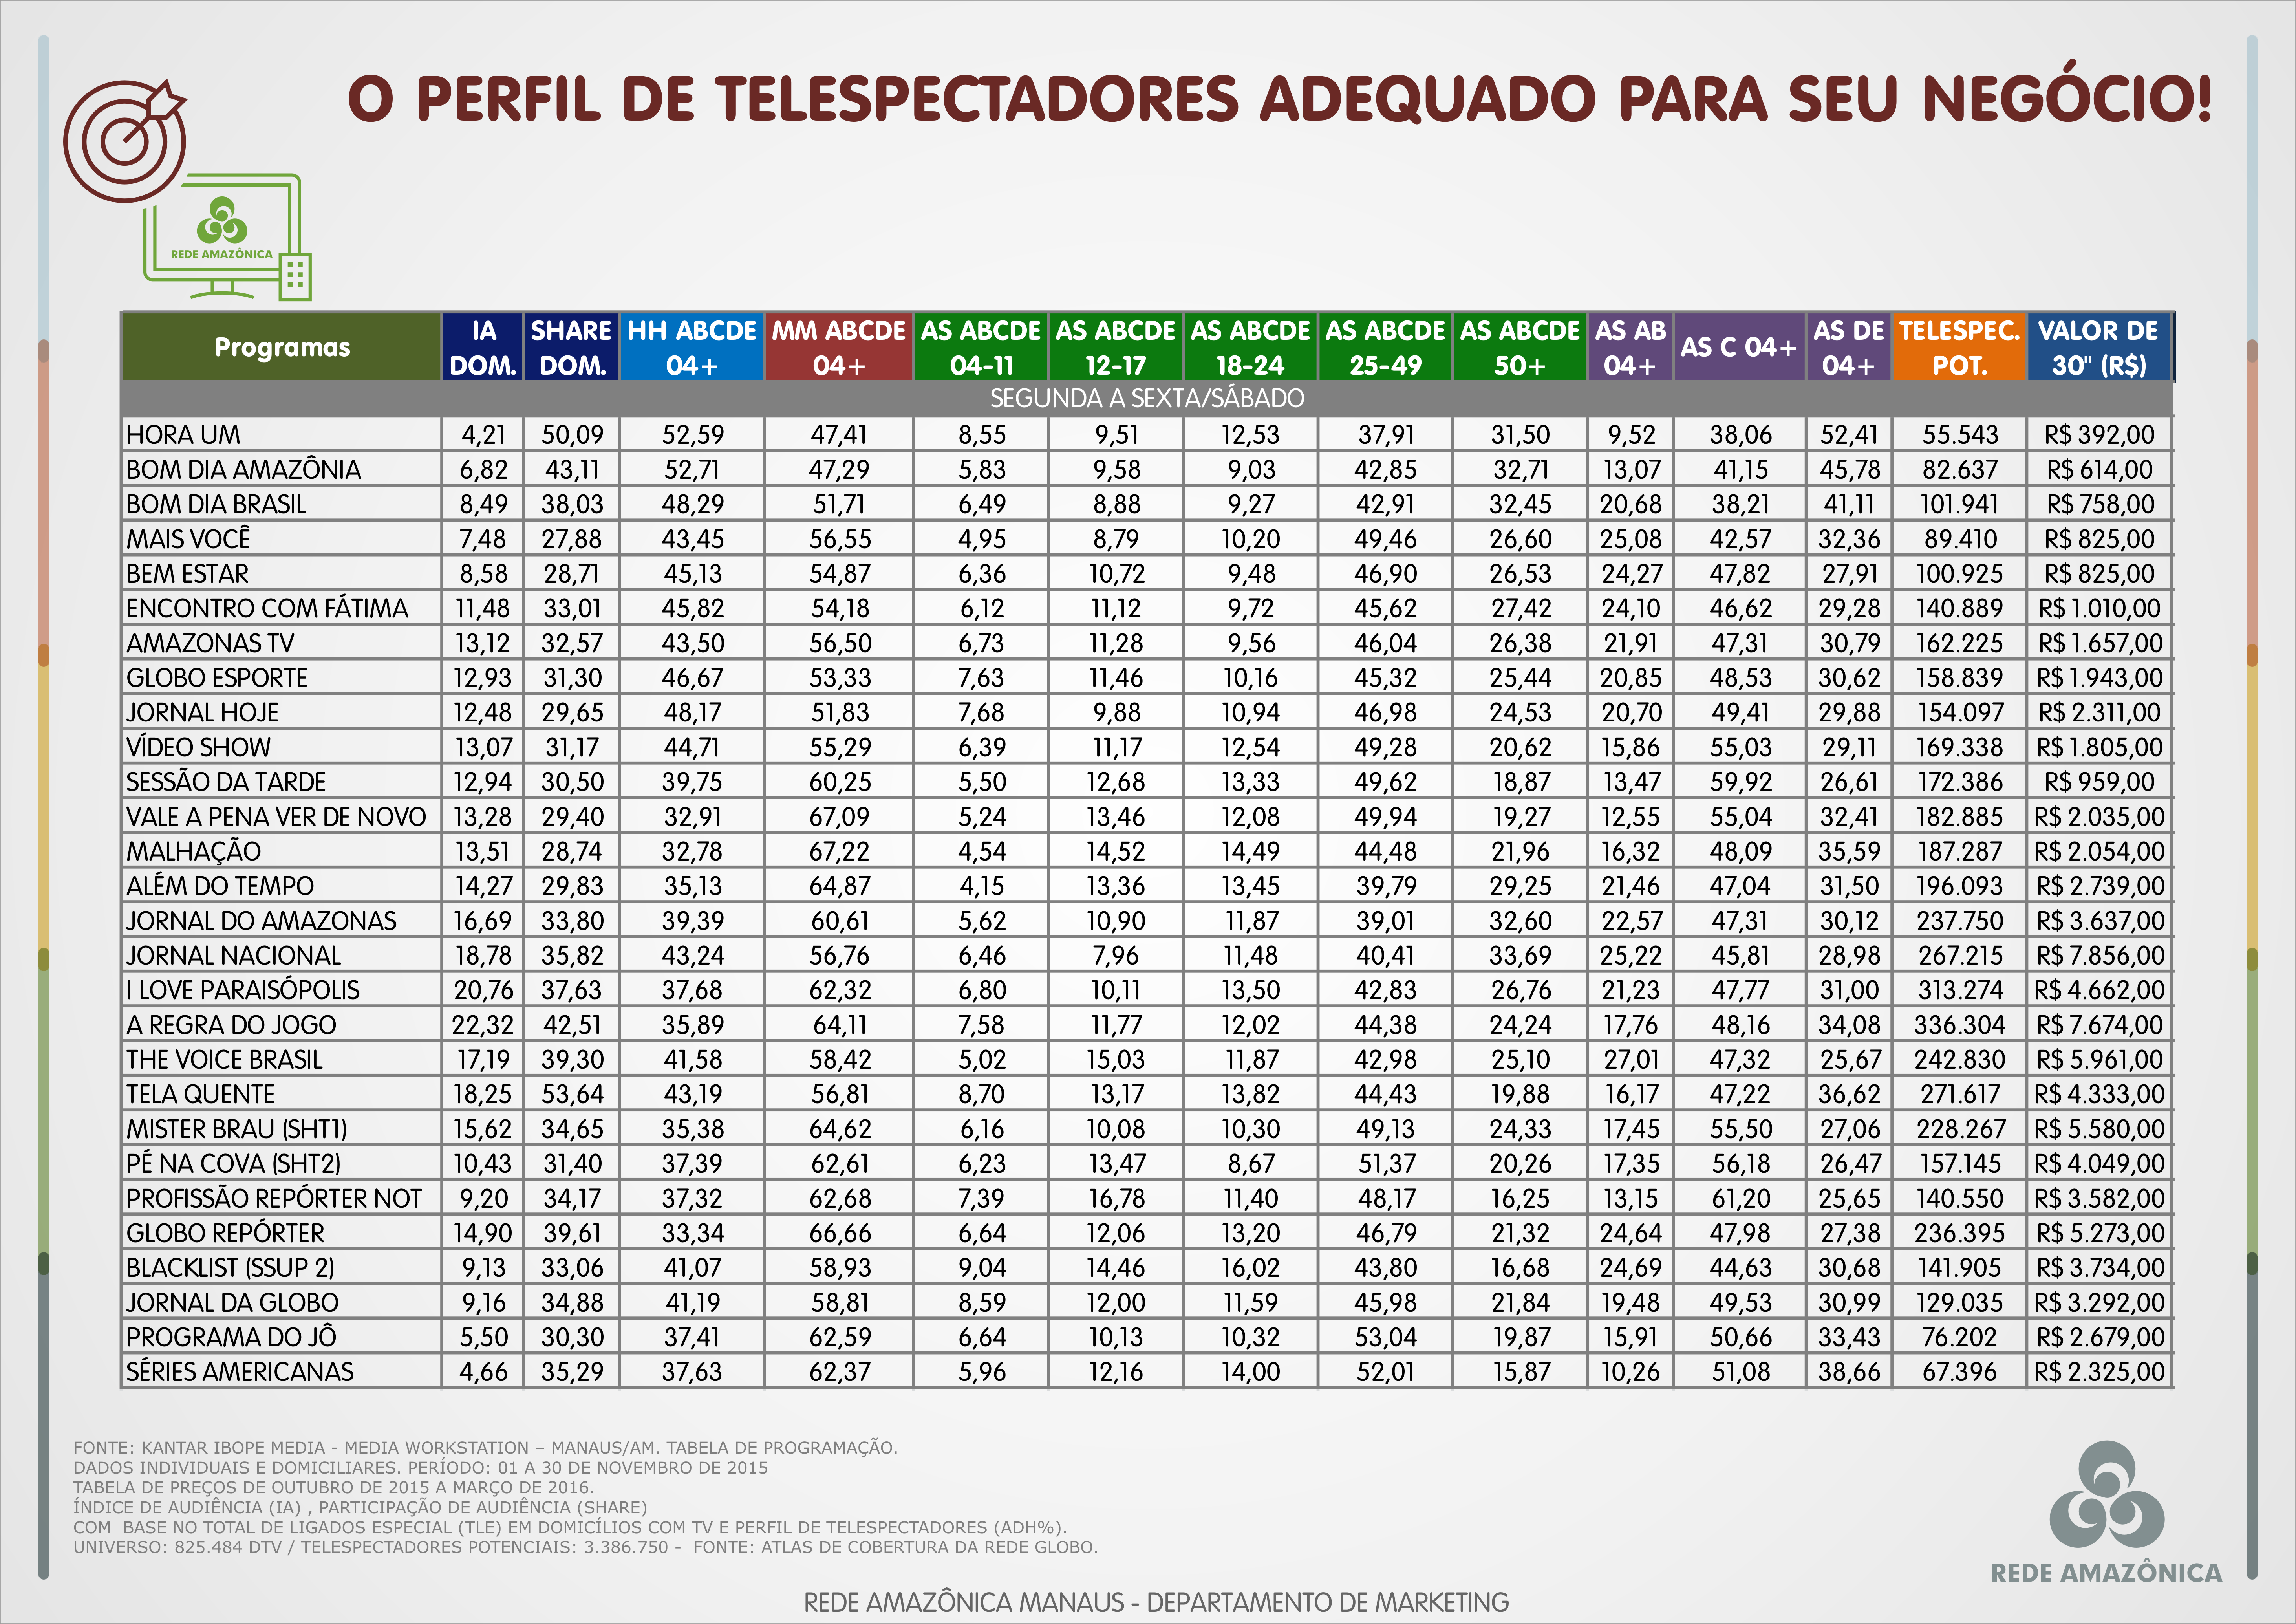 Perfil dos telespectadores (Foto: Rede Amazônica)